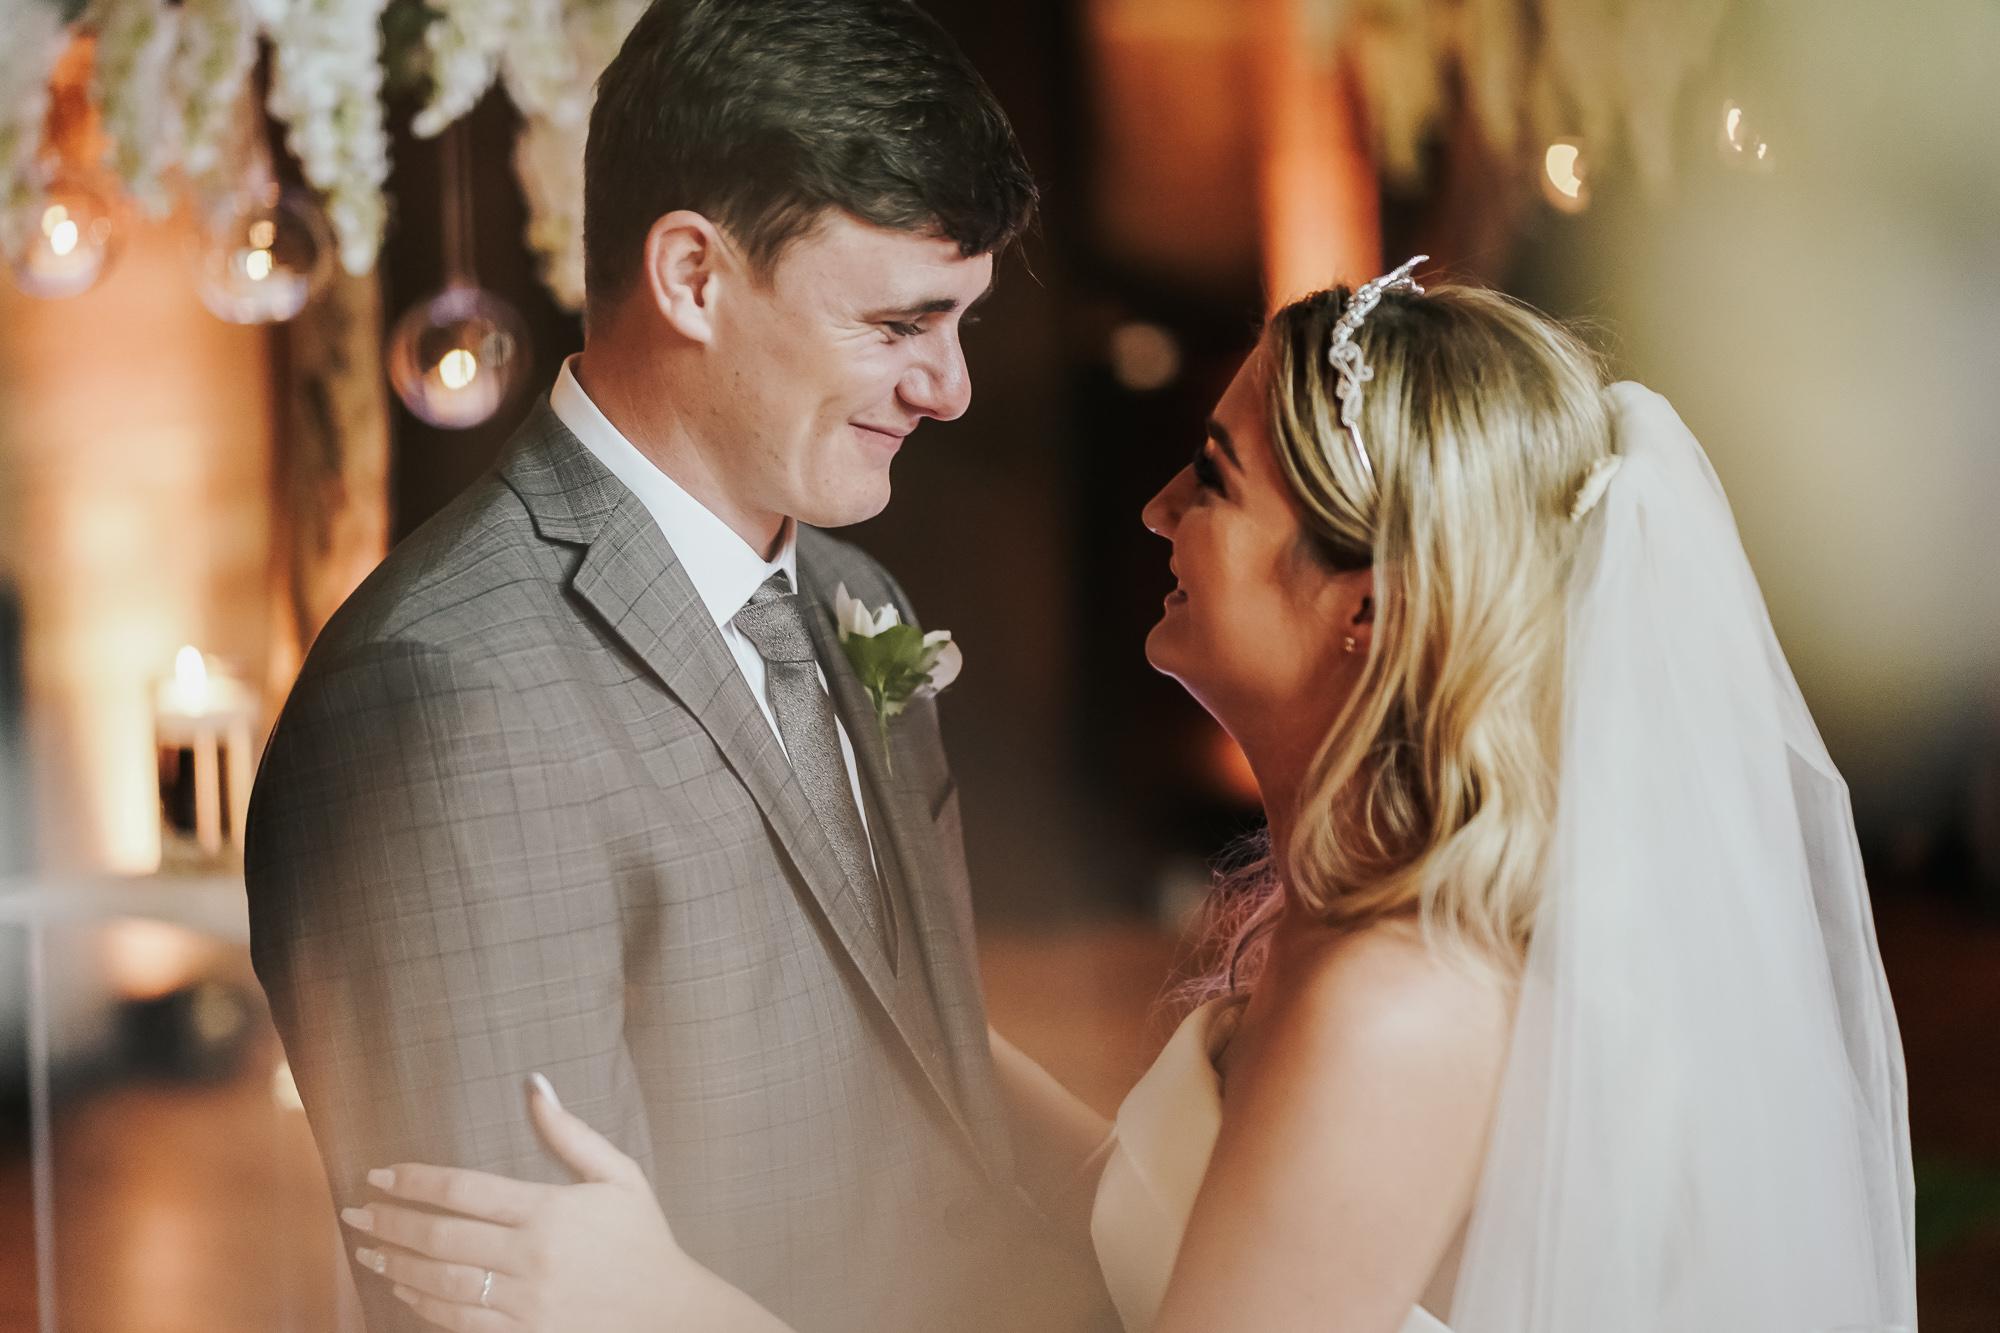 Peckforton Castle wedding photography cheshire wedding photographer (28 of 57).jpg